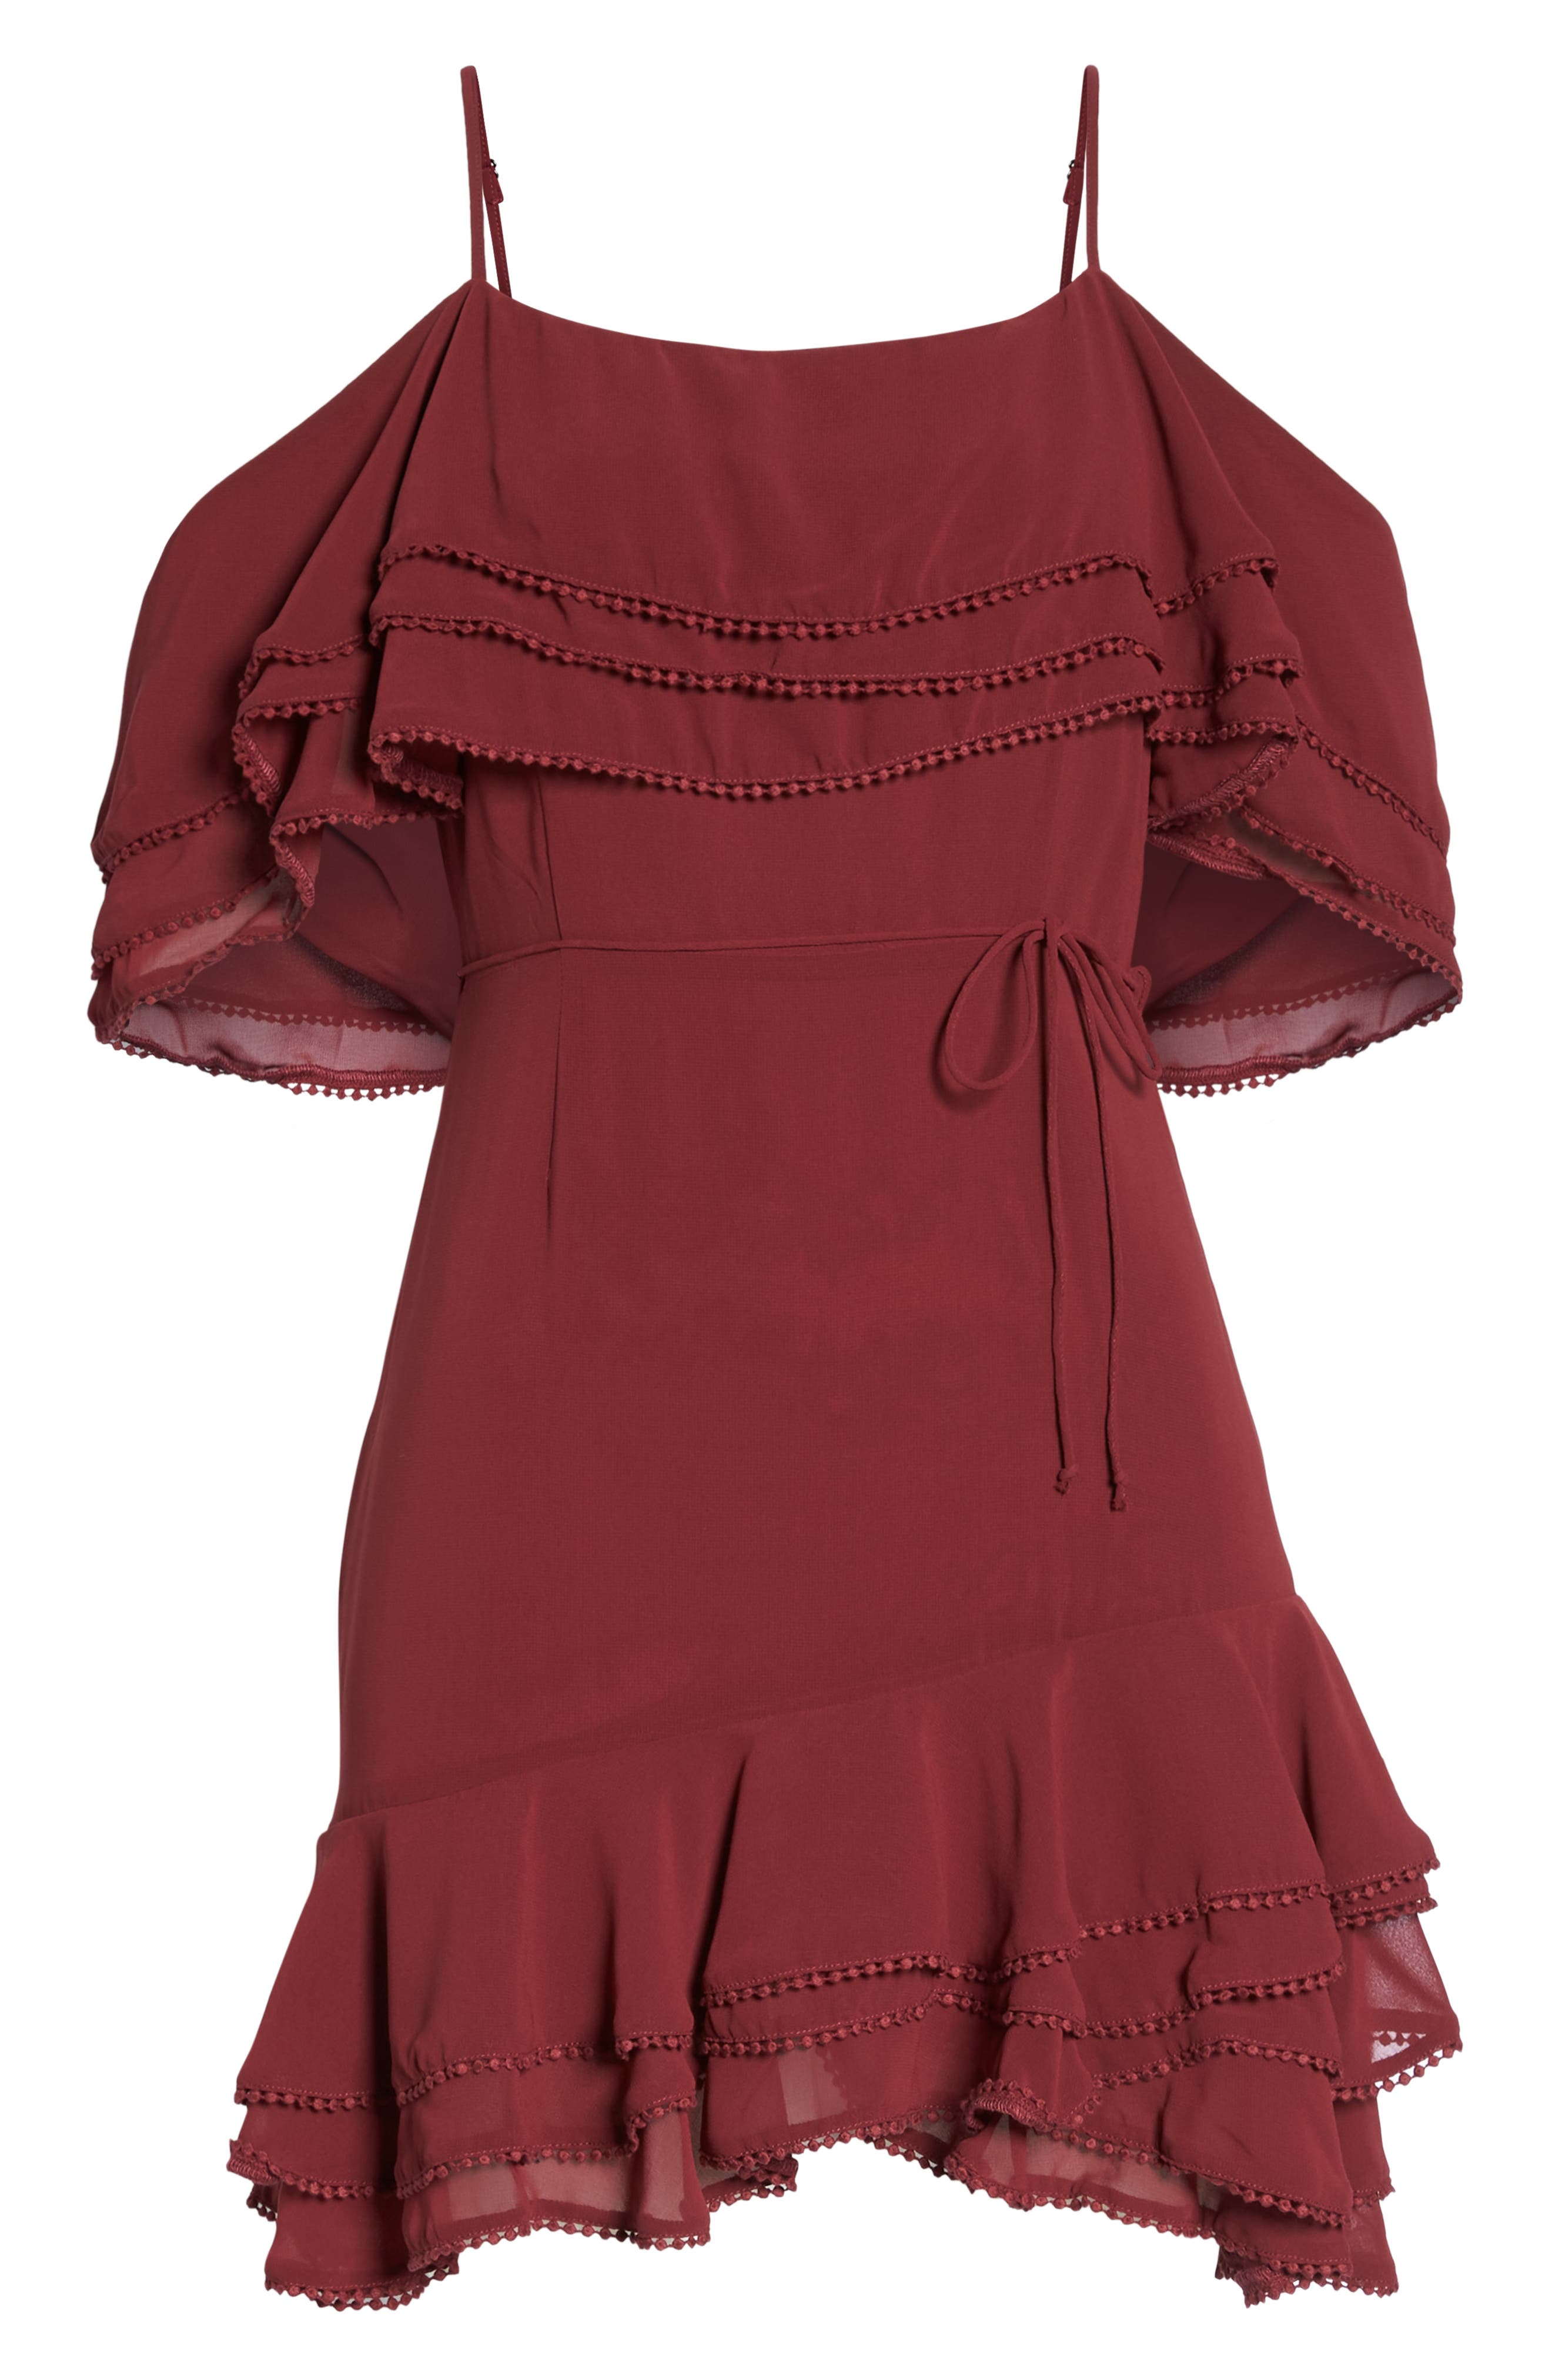 BB DAKOTA, Up All Night Layered Cold Shoulder Dress, Alternate thumbnail 7, color, 930